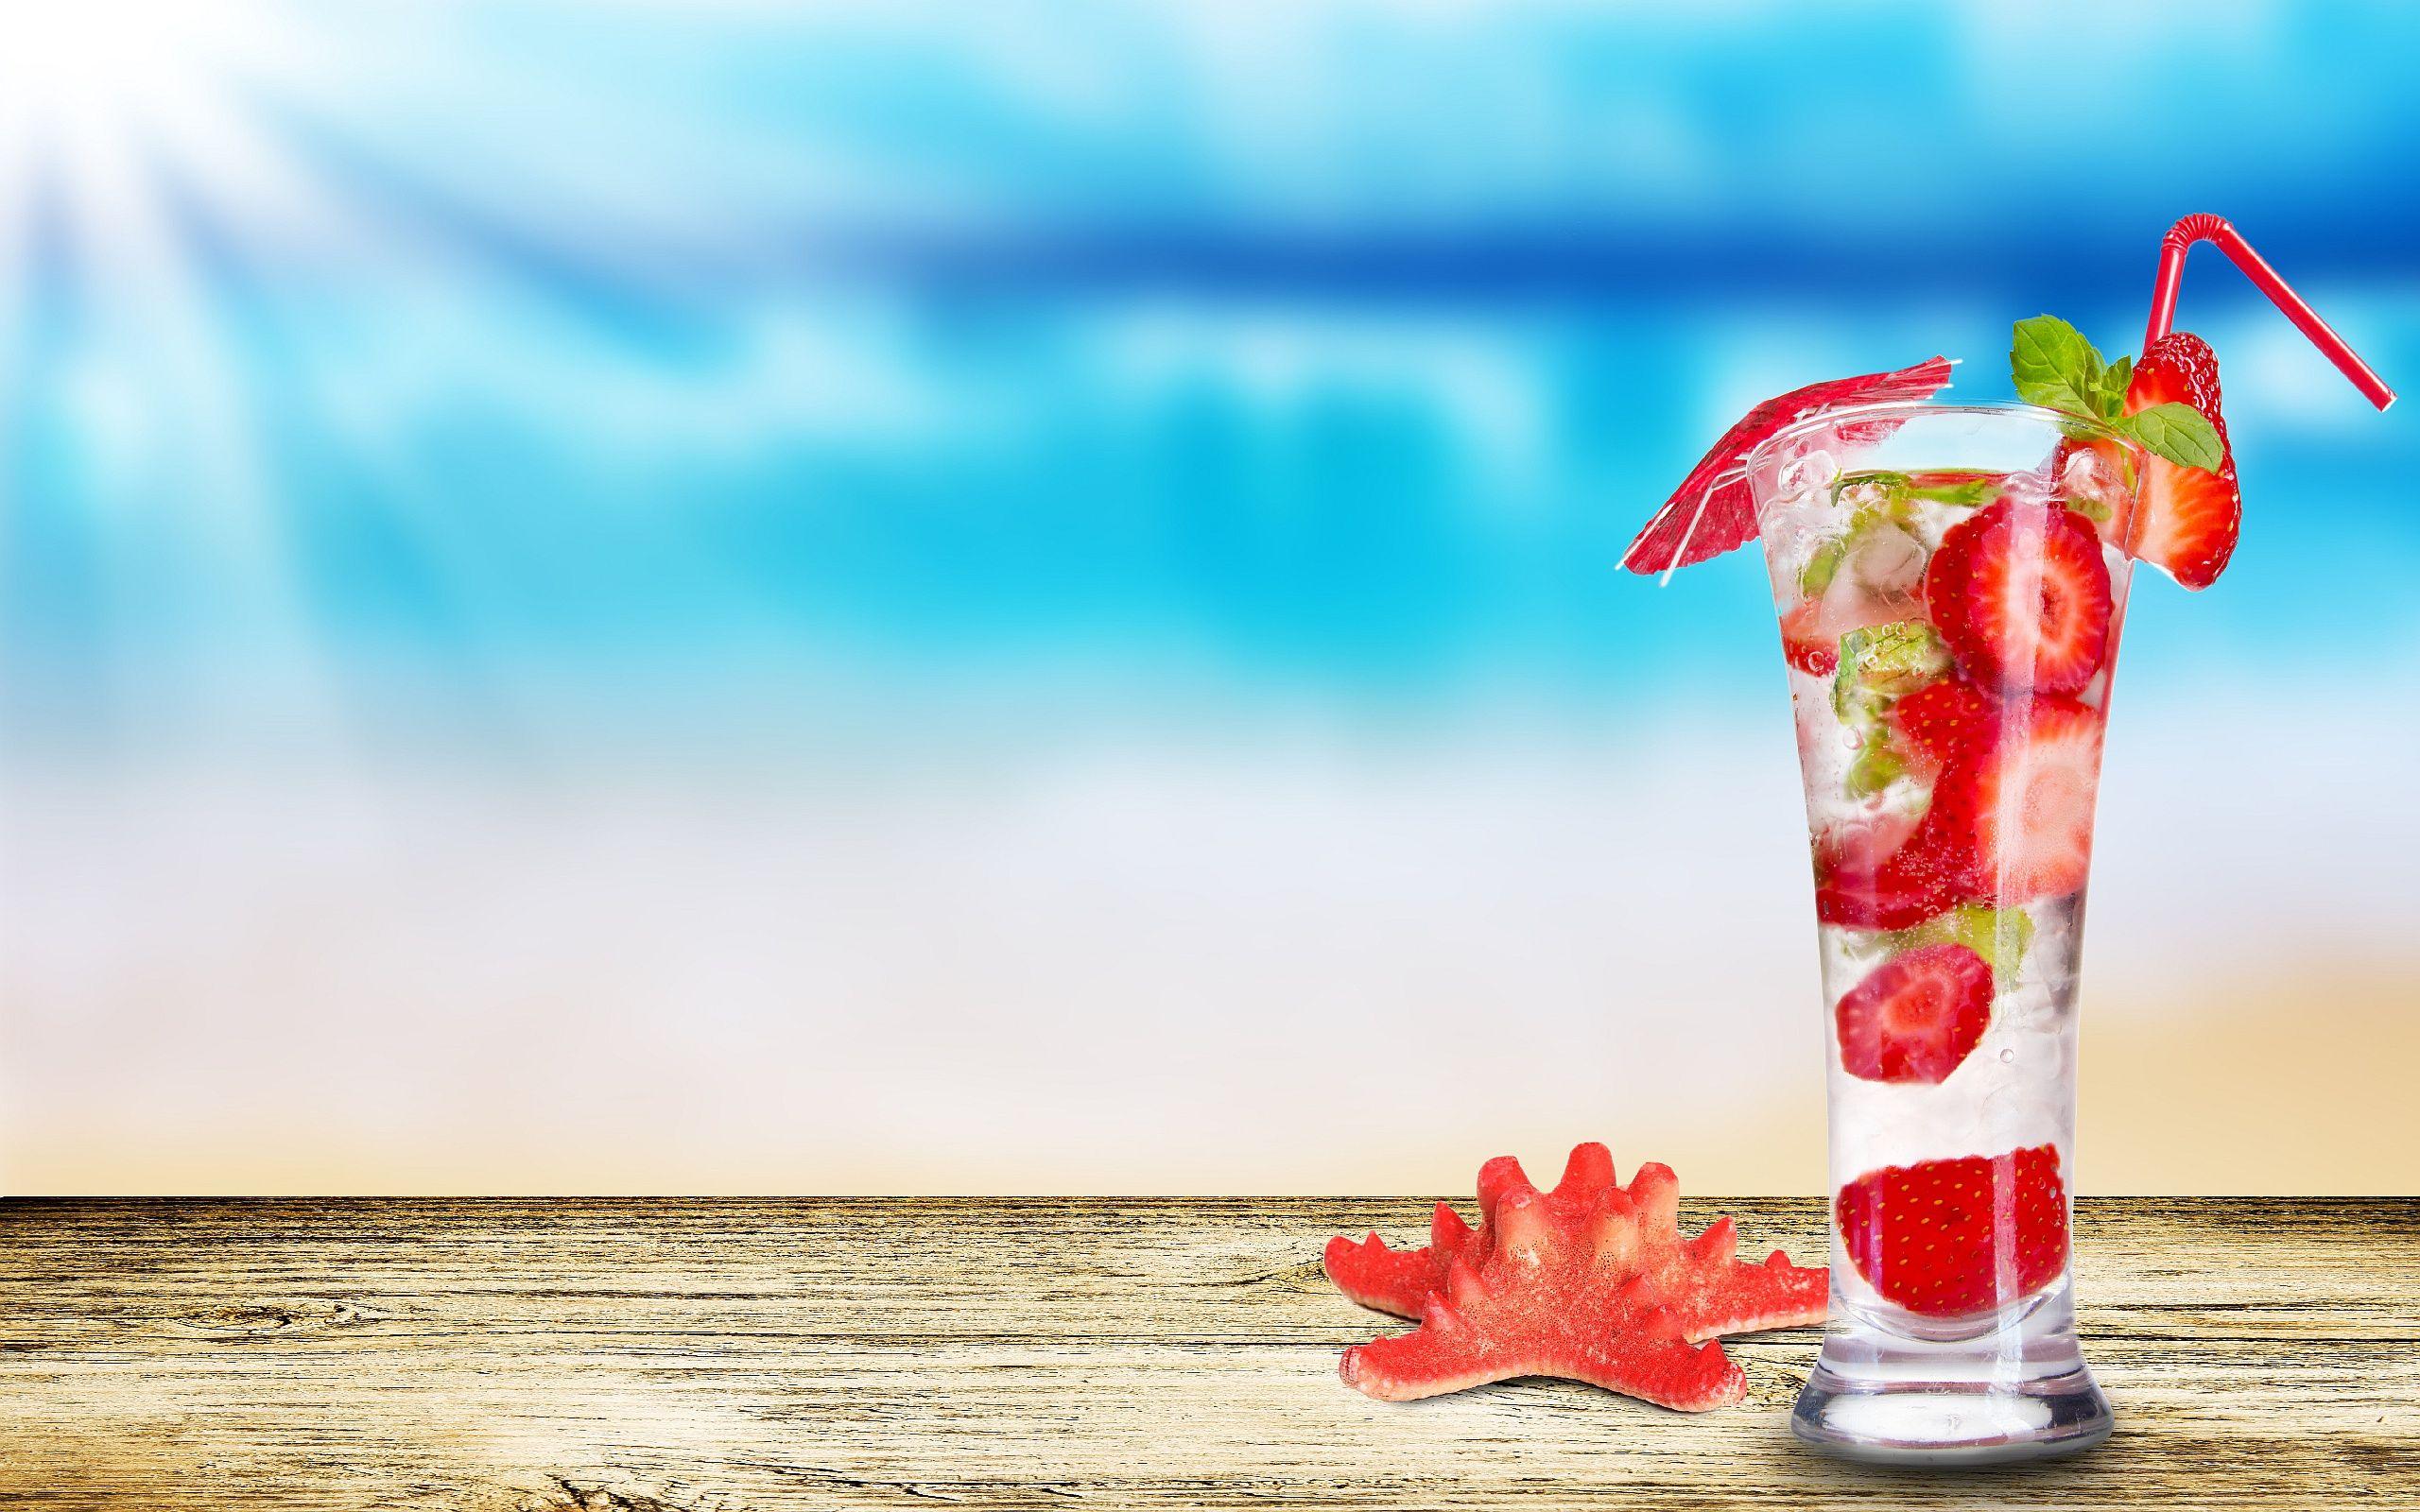 Strawberry Mojito HD Widescreen Desktop Wallpaper Places To